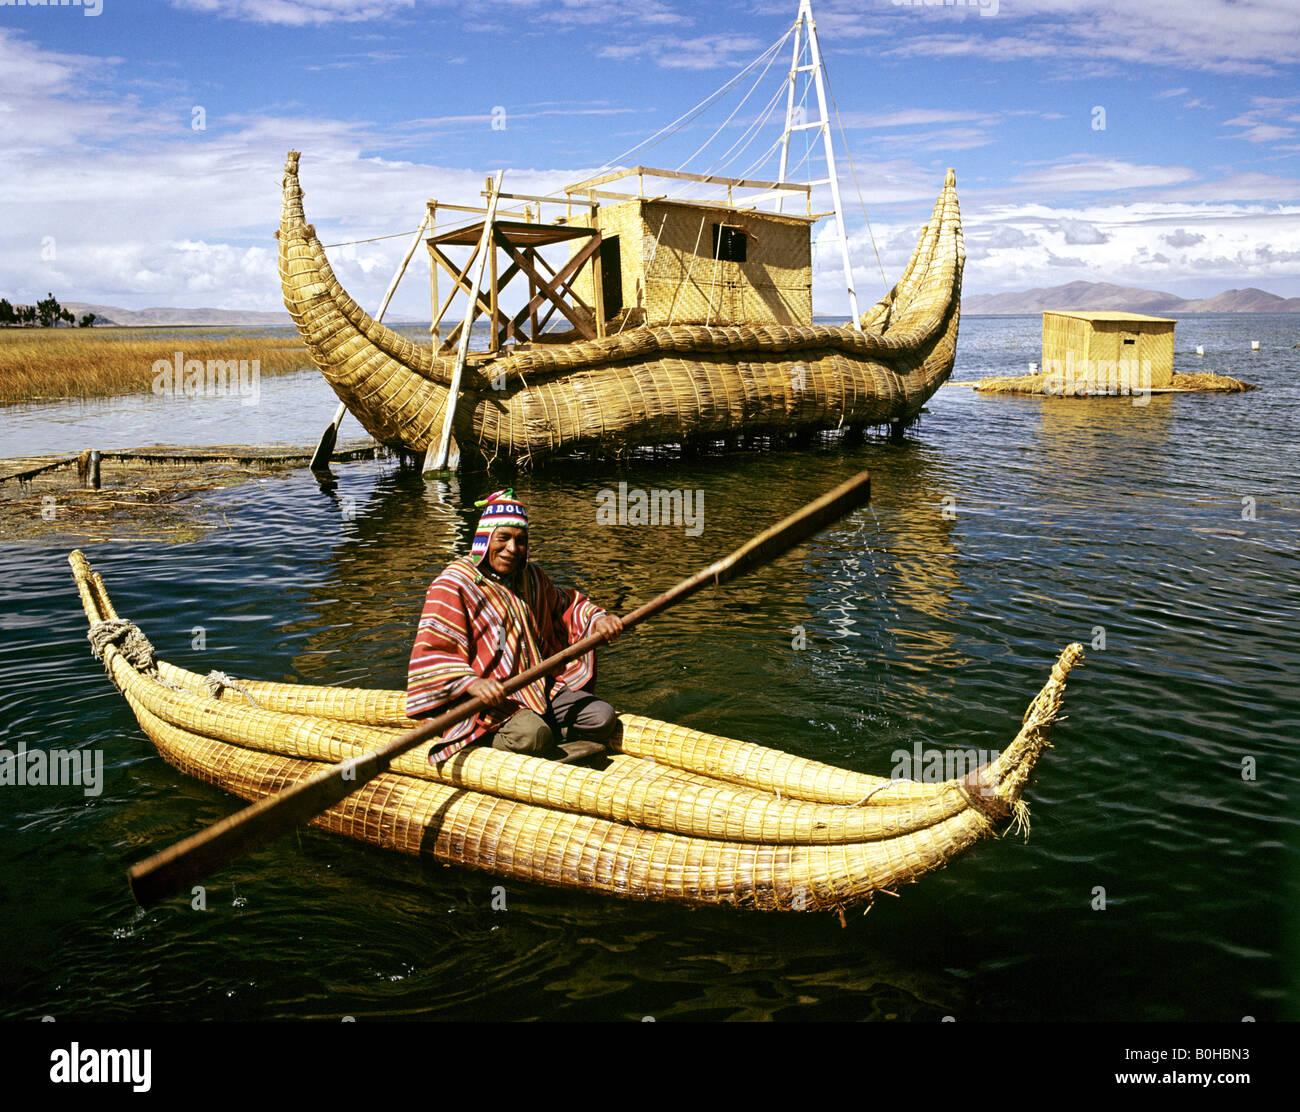 Papyrus boat on Lake Titicaca, Titi Kontiki, Bolivia - Stock Image